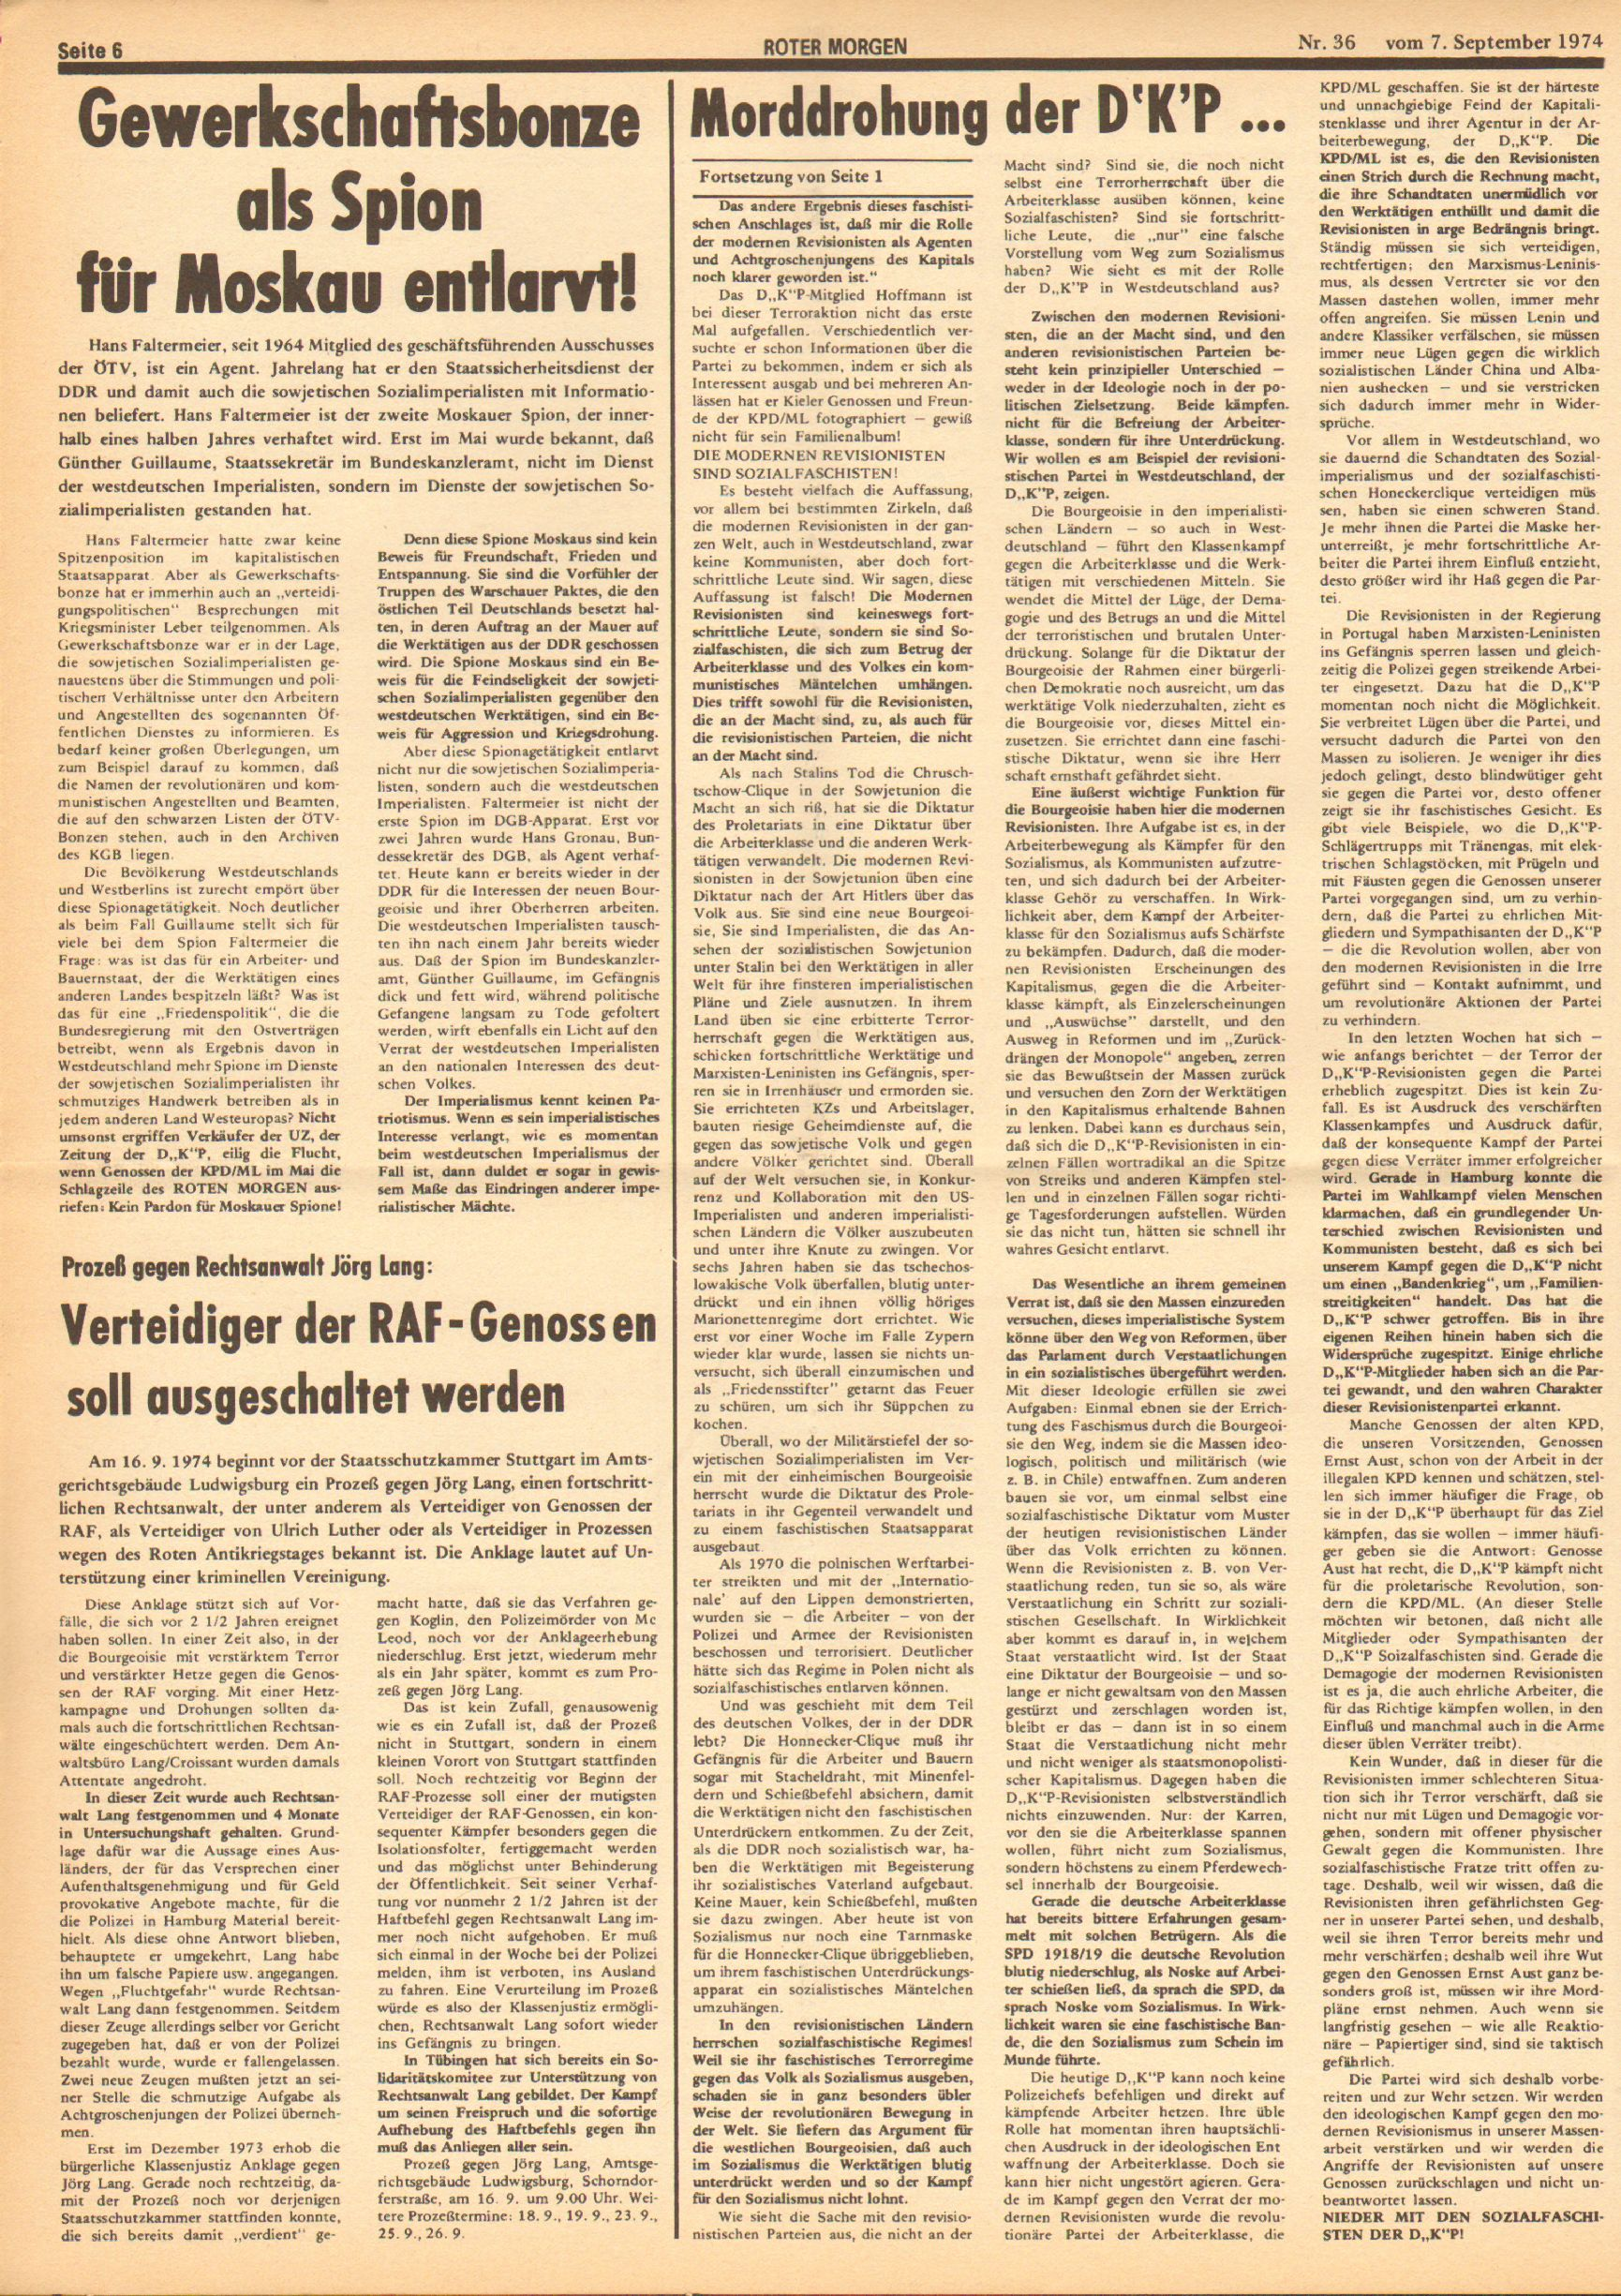 Roter Morgen, 8. Jg., 7. September 1974, Nr. 36, Seite 6